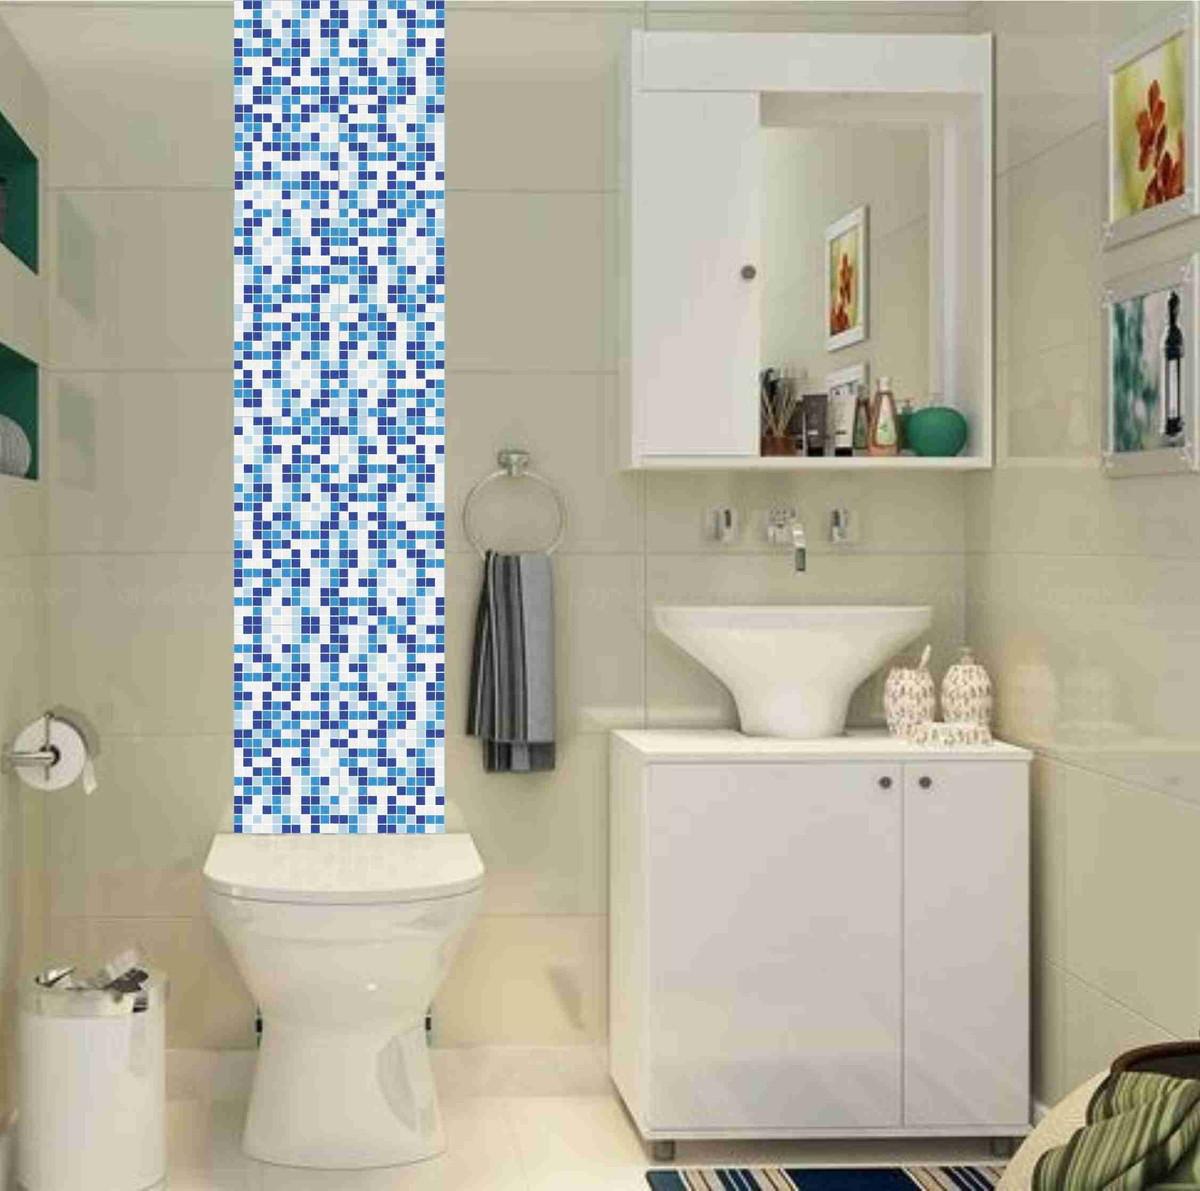 banheiro kit pastilhas azul bco frete gratis verde kit pastilhas azul #2E719D 1200x1191 Banheiro Branco Com Pastilhas Verdes